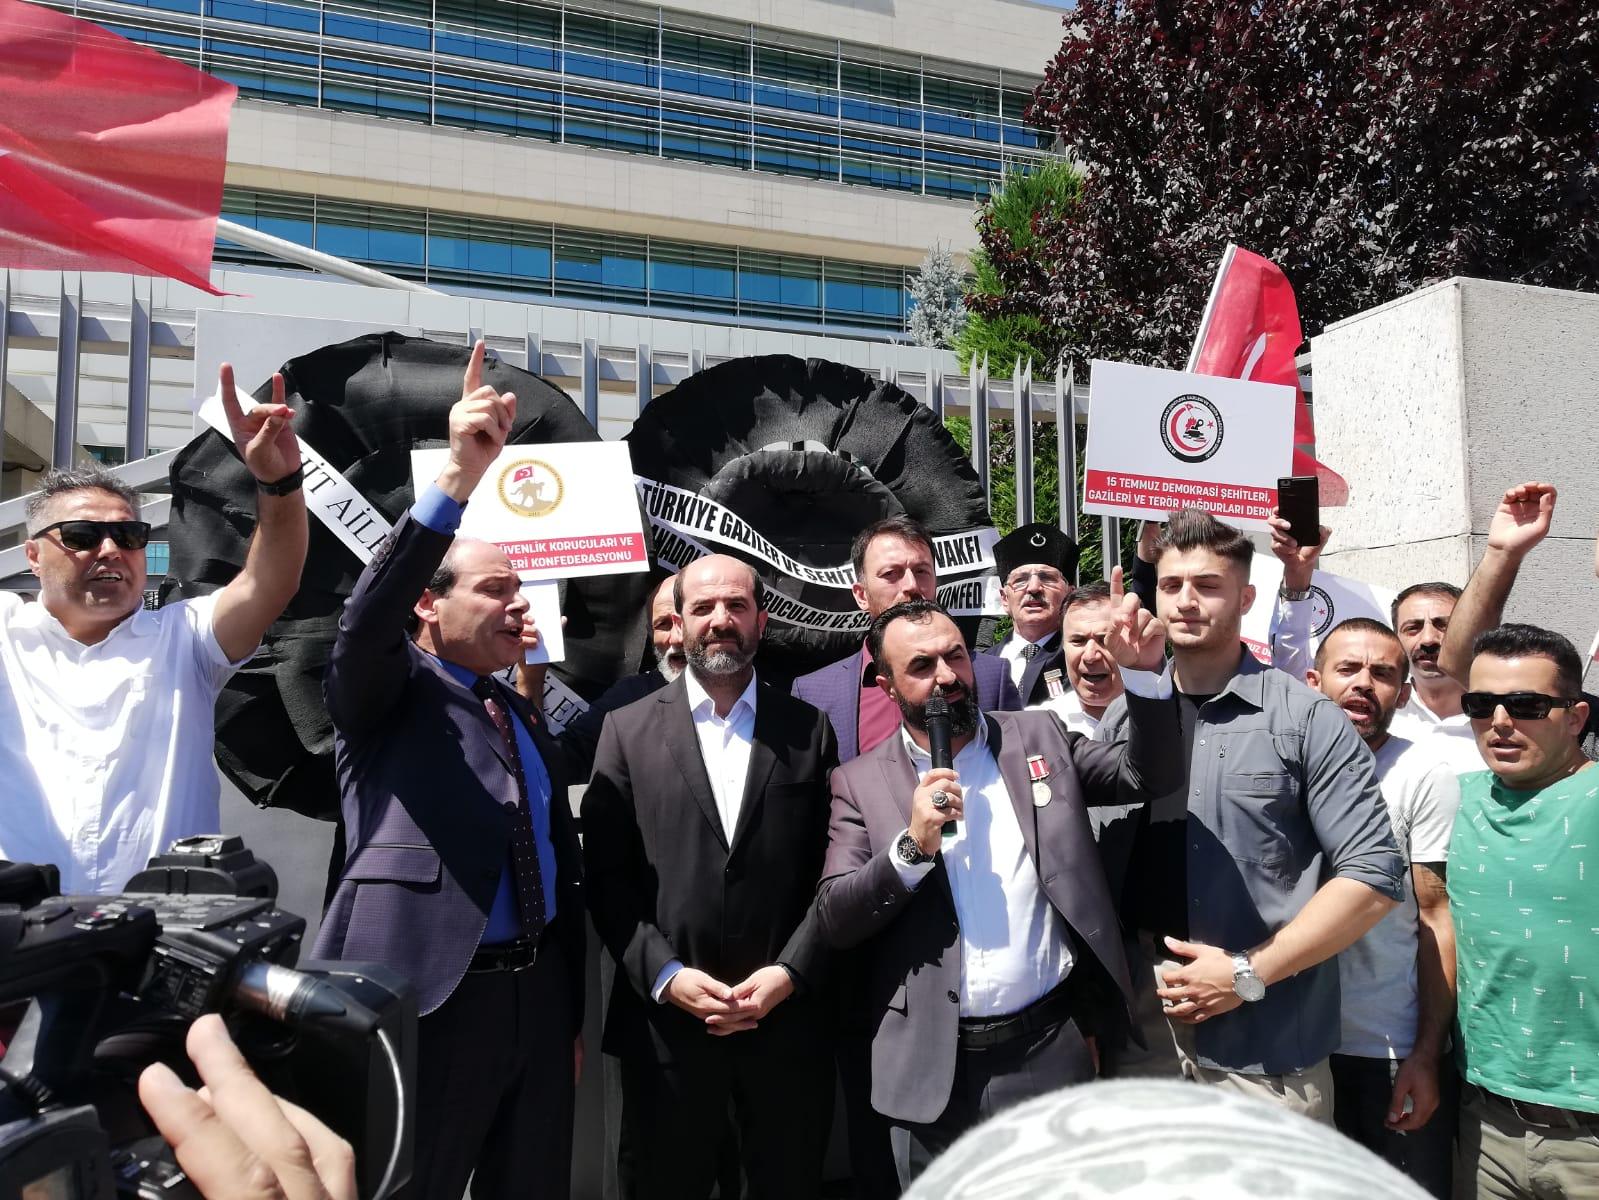 ANAYASA MAHKEMESİNİN ALMIŞ OLDUĞU KARARI PROTESTO ETTİK...